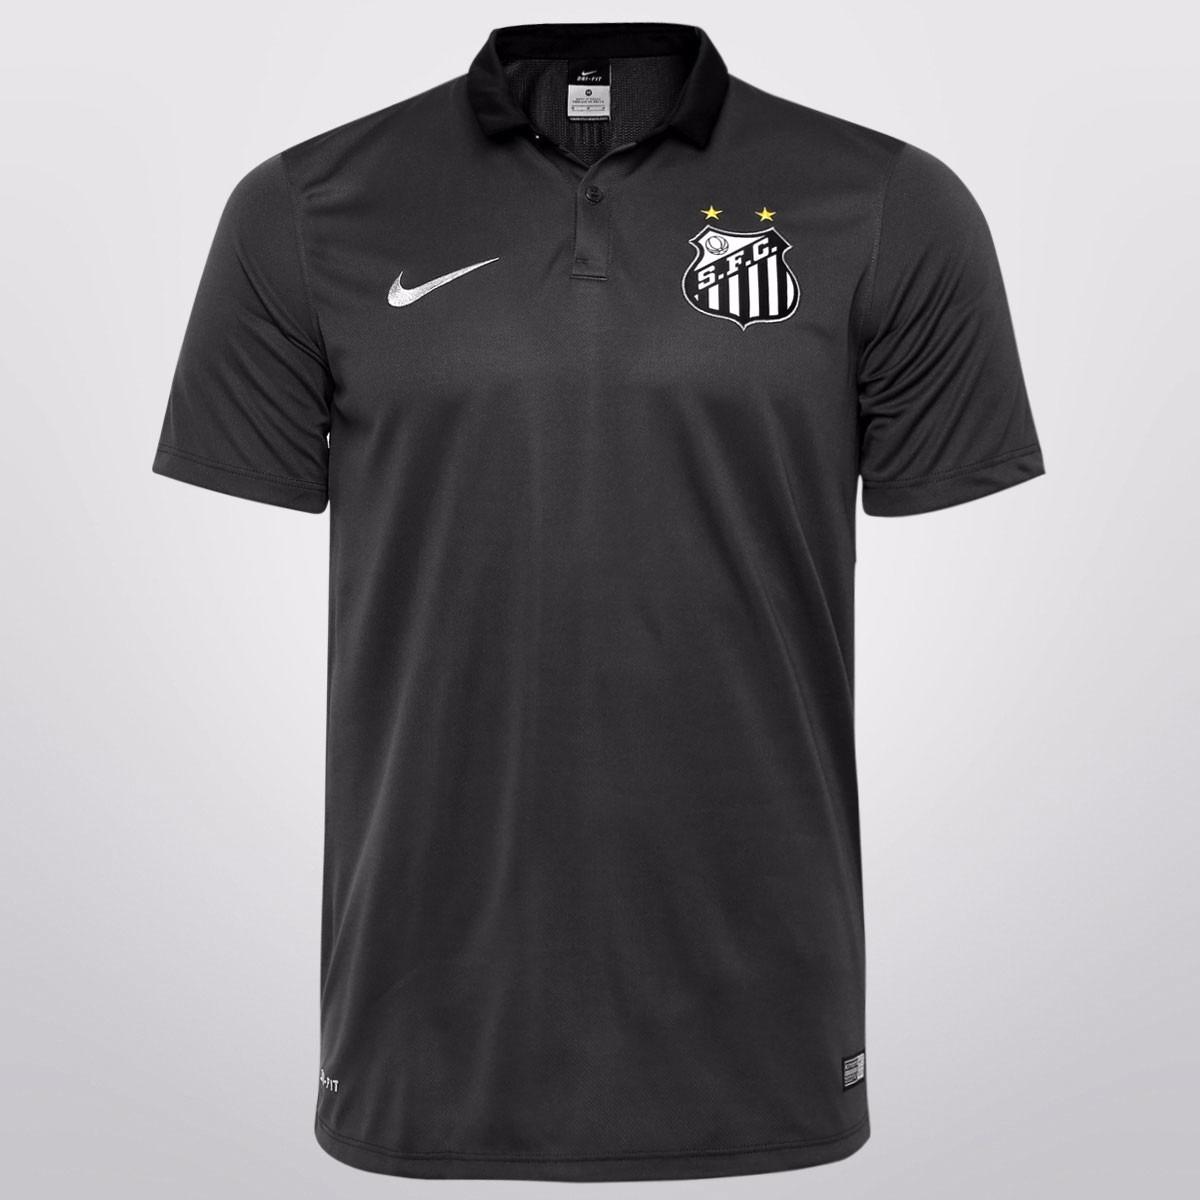 camisa santos fc 2015 cinza - nike - original! retirar. Carregando zoom. 0b7997b483cf7